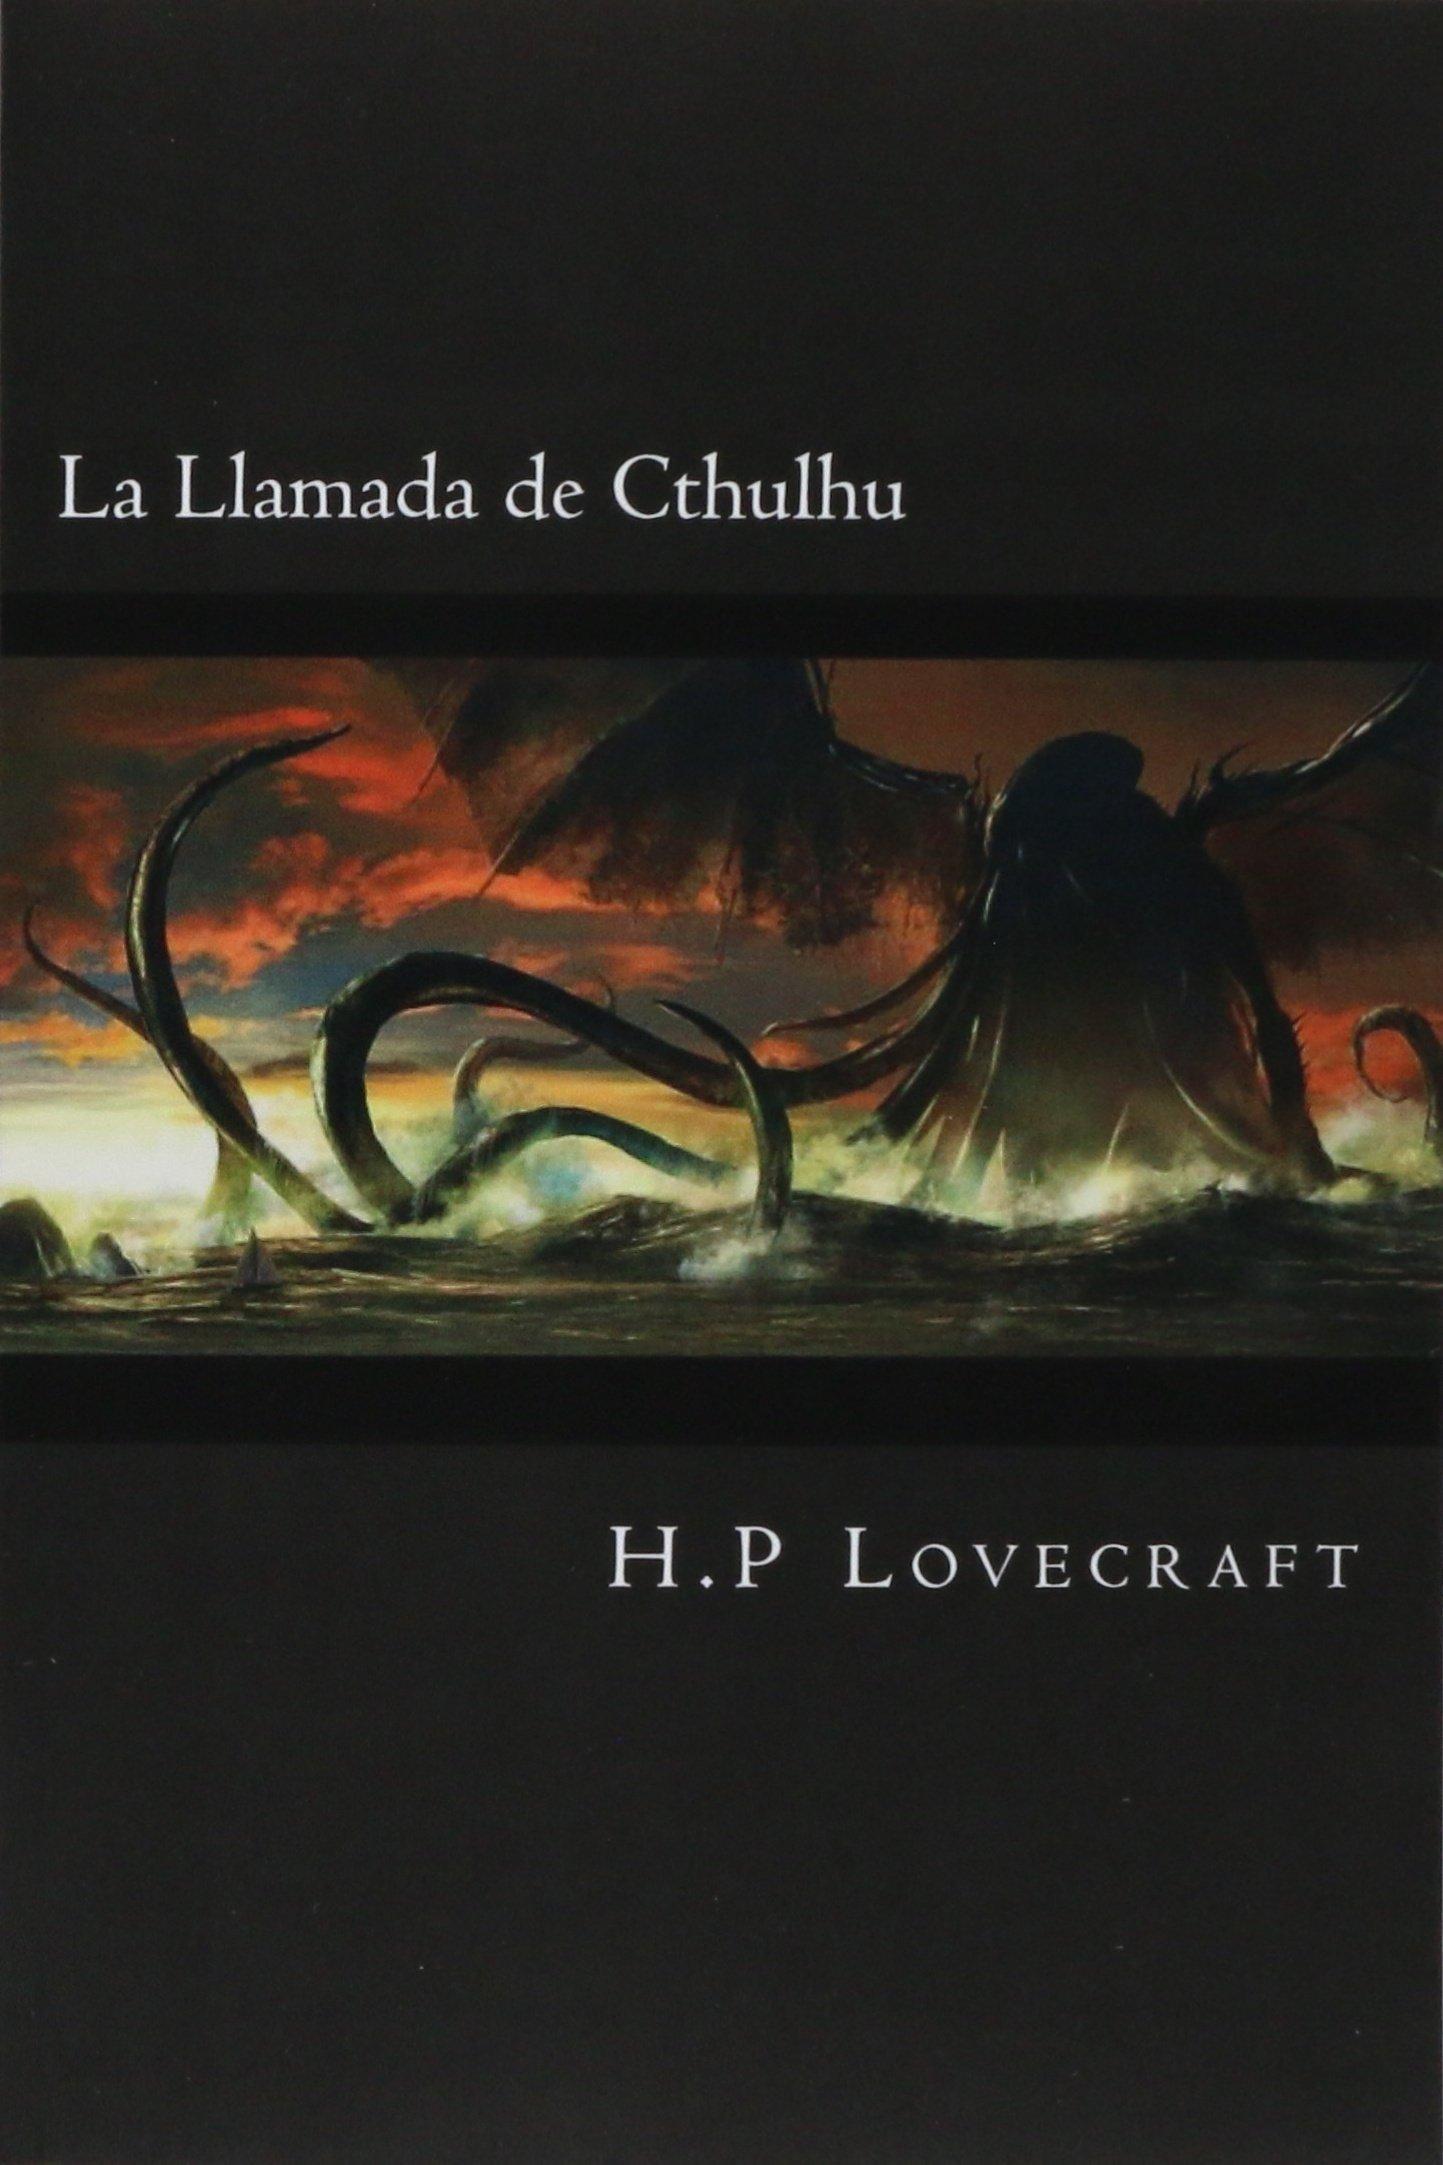 La Llamada de Cthulhu (Spanish Edition): H.P Lovecraft: 9781540899422:  Amazon.com: Books